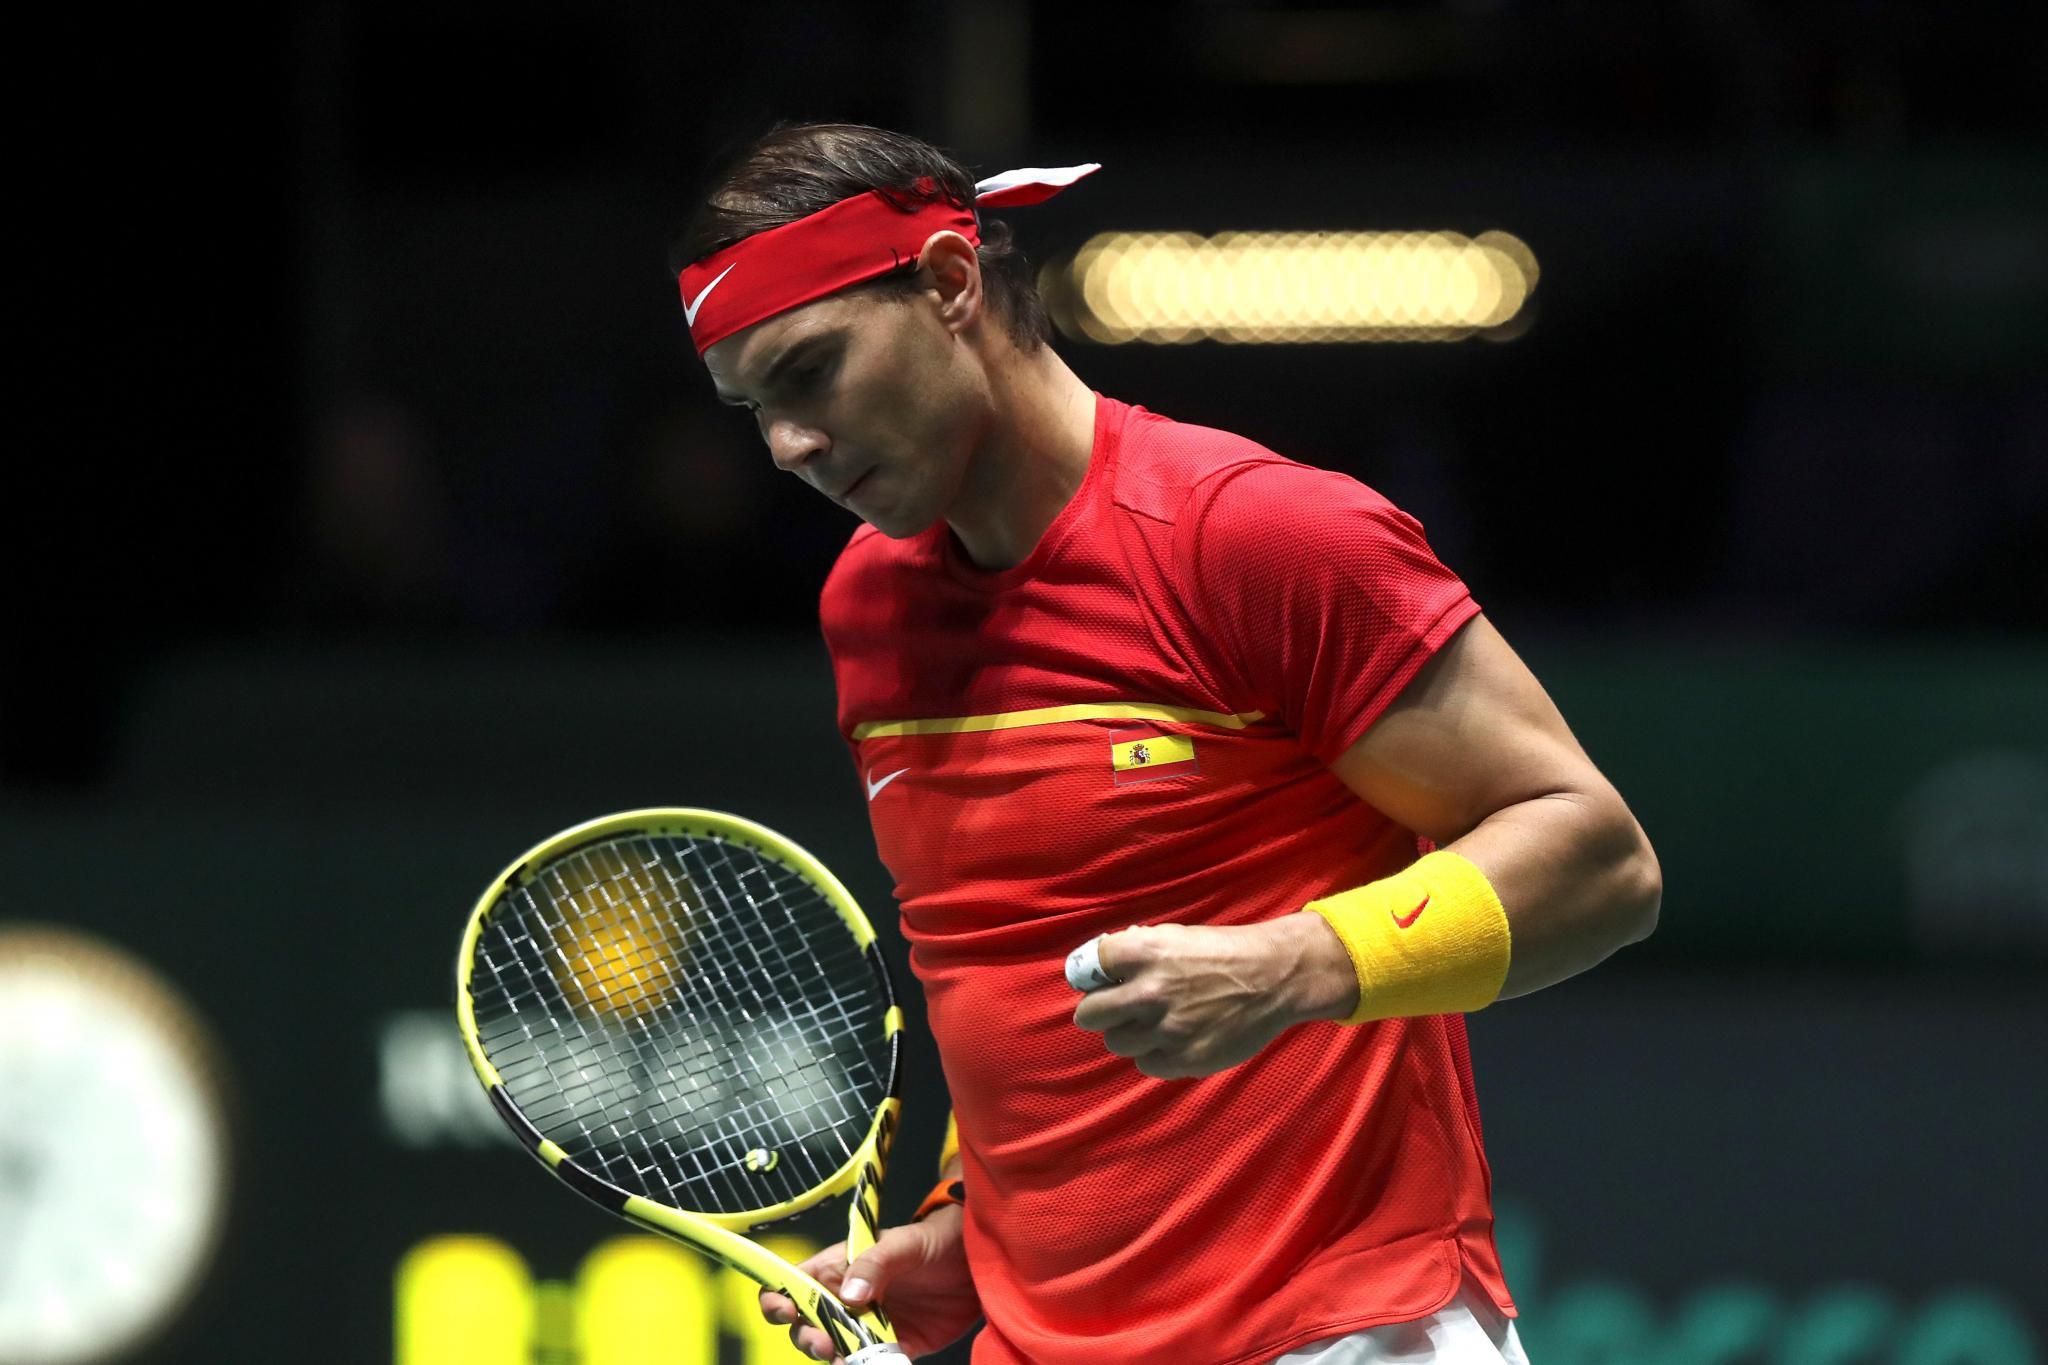 Rafa Nadal (ESP) vs Karen Jachánov (RUS)